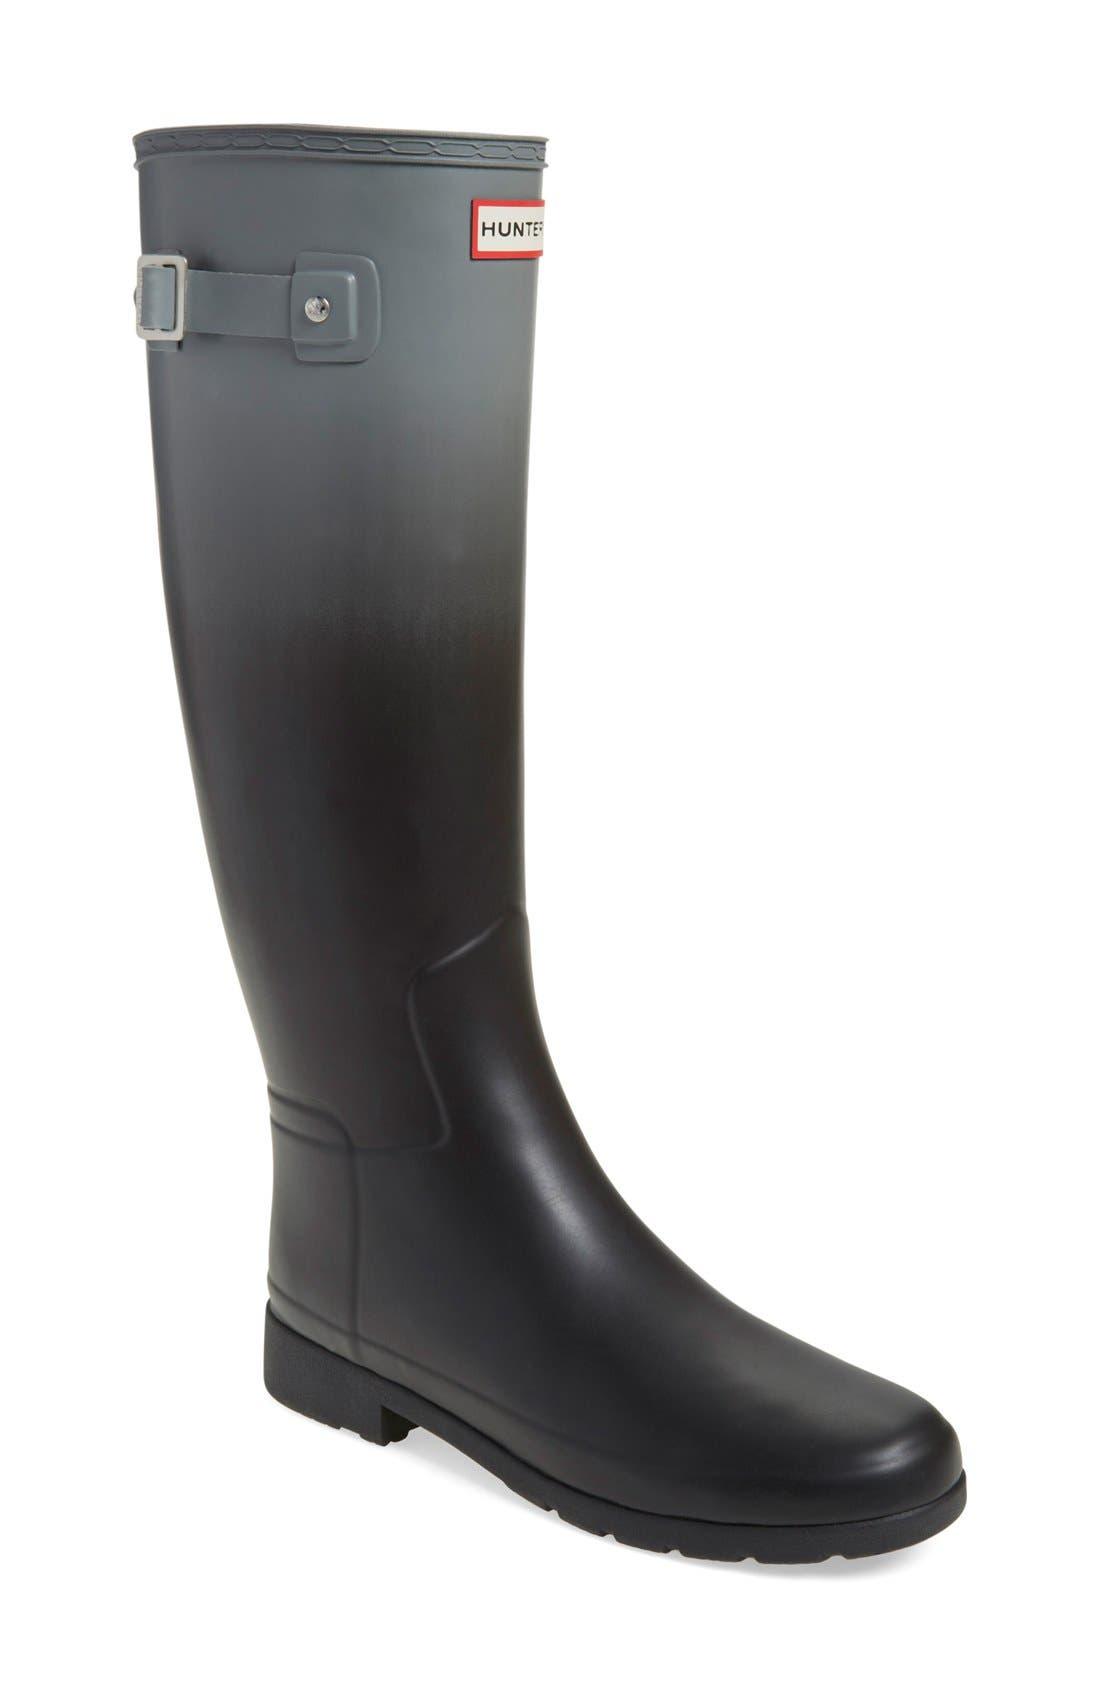 Alternate Image 1 Selected - Hunter 'Original Tall - Haze' Rain Boot (Women)